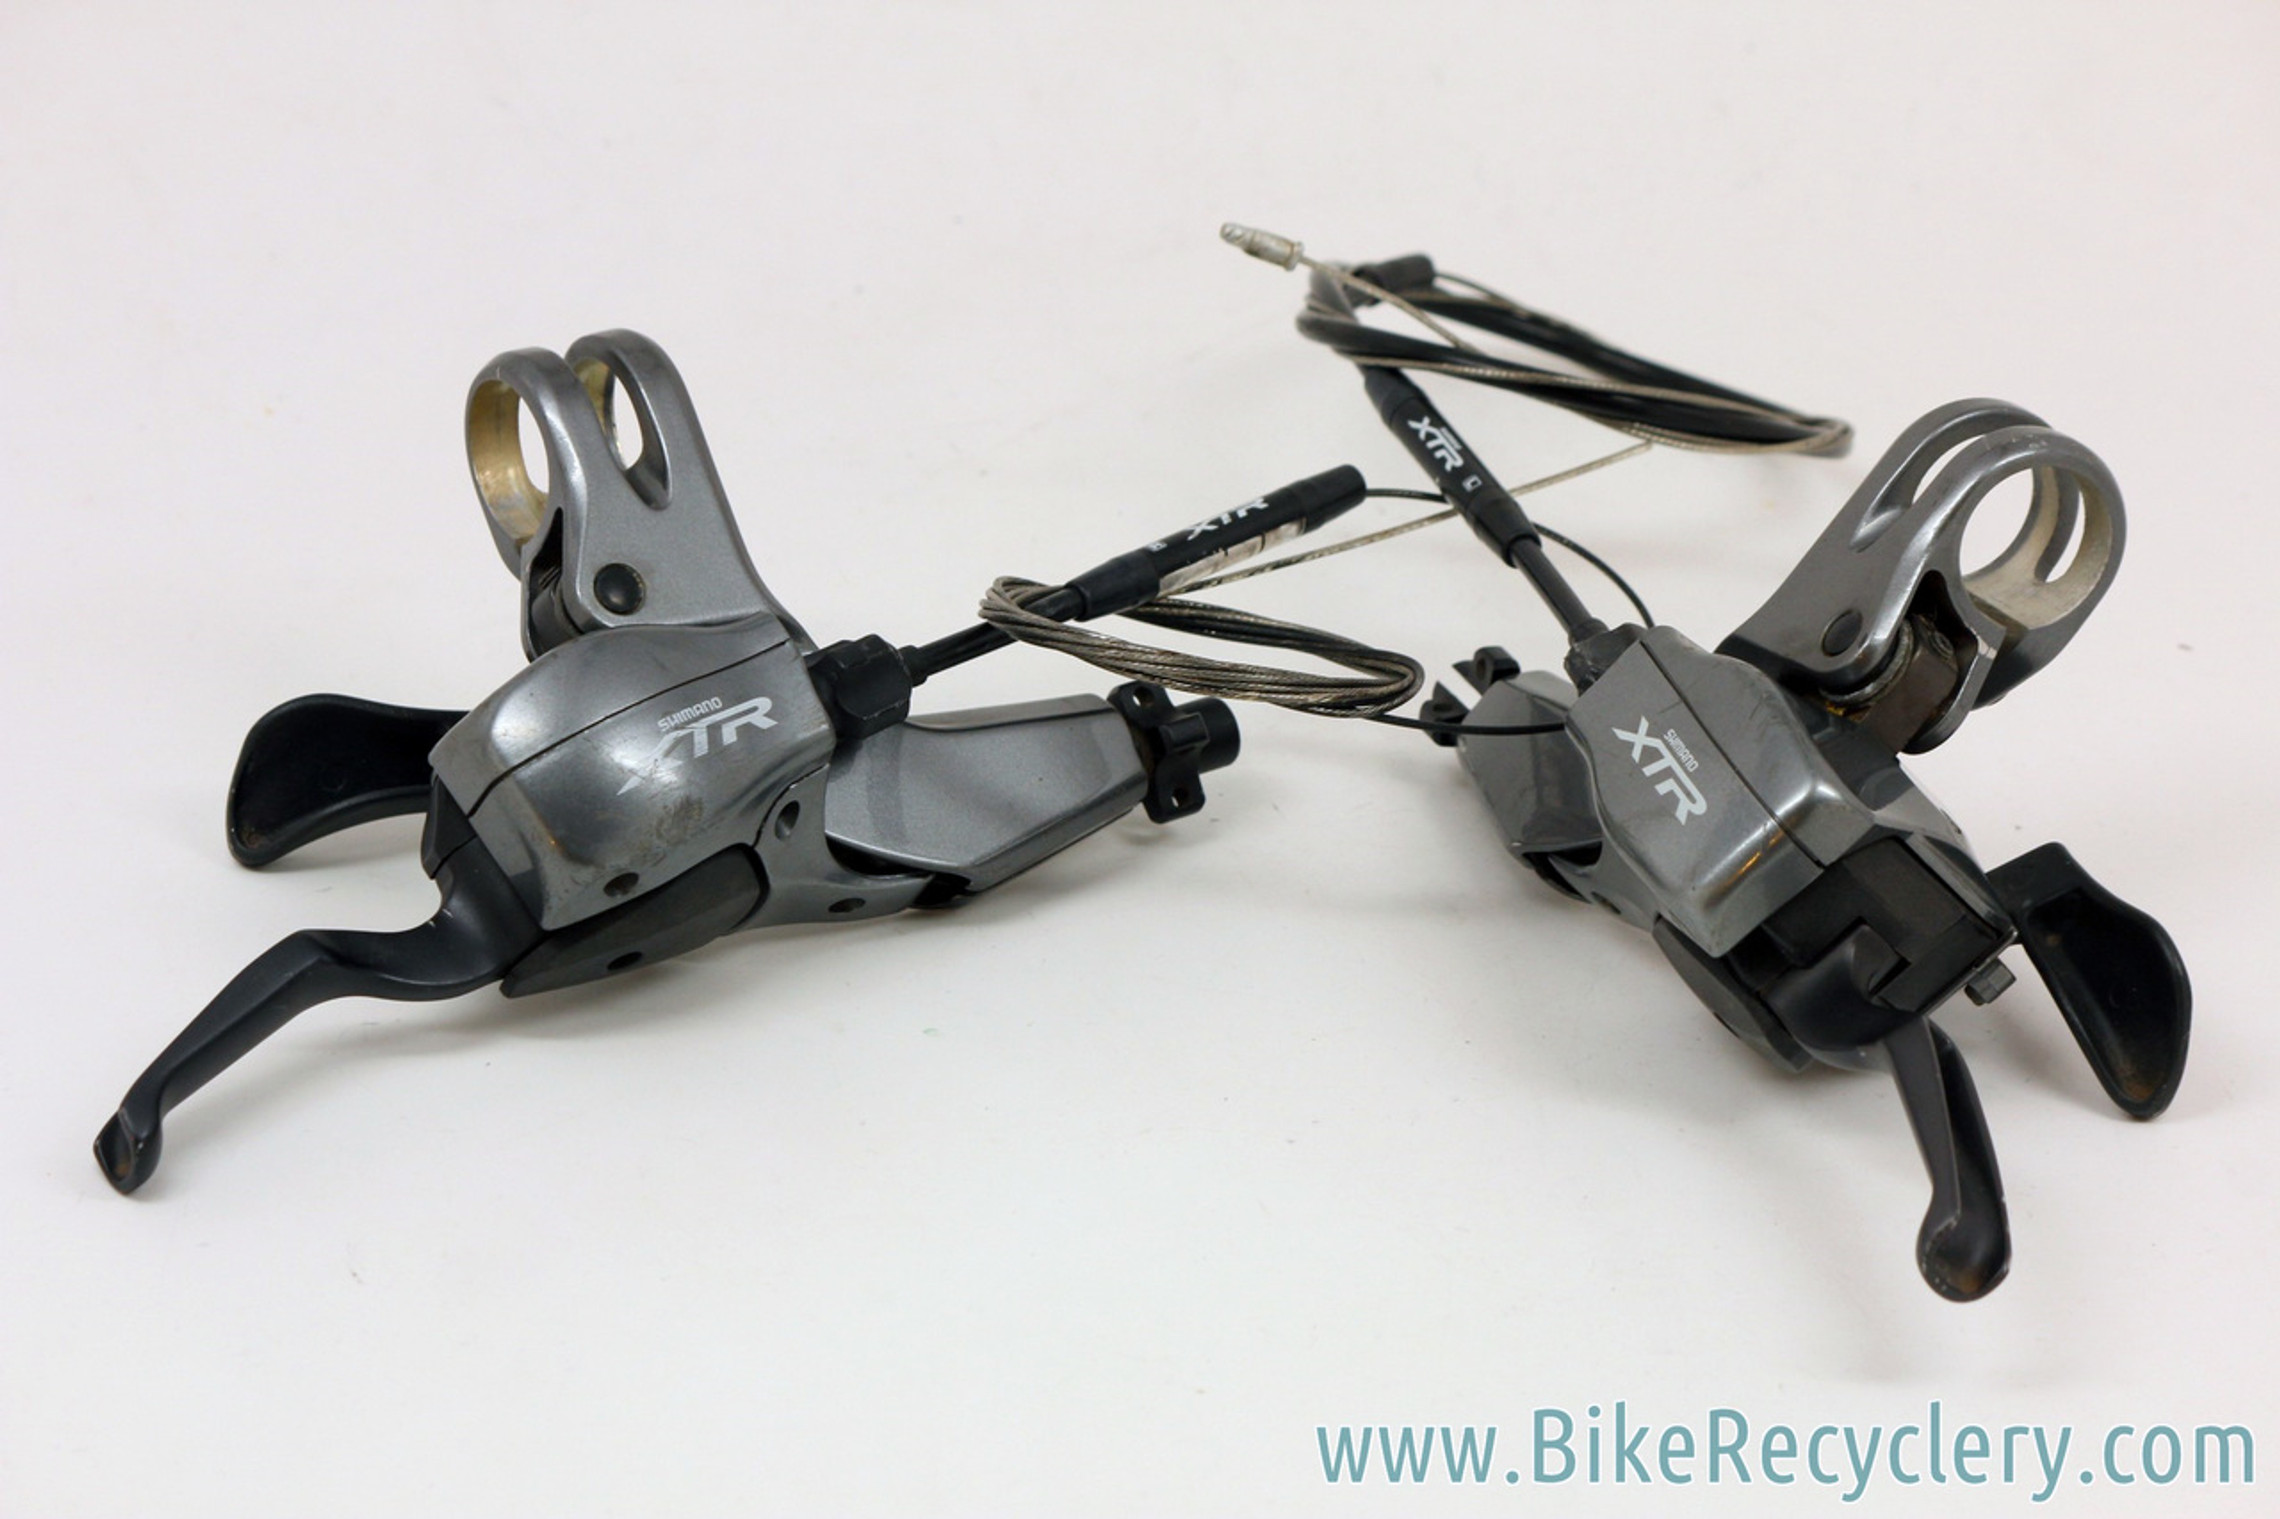 RIGHT SWITCHGEAR BRAKE LEVER OVP New! Shimano XTR st-m965 3x9 TRIPLE LEFT